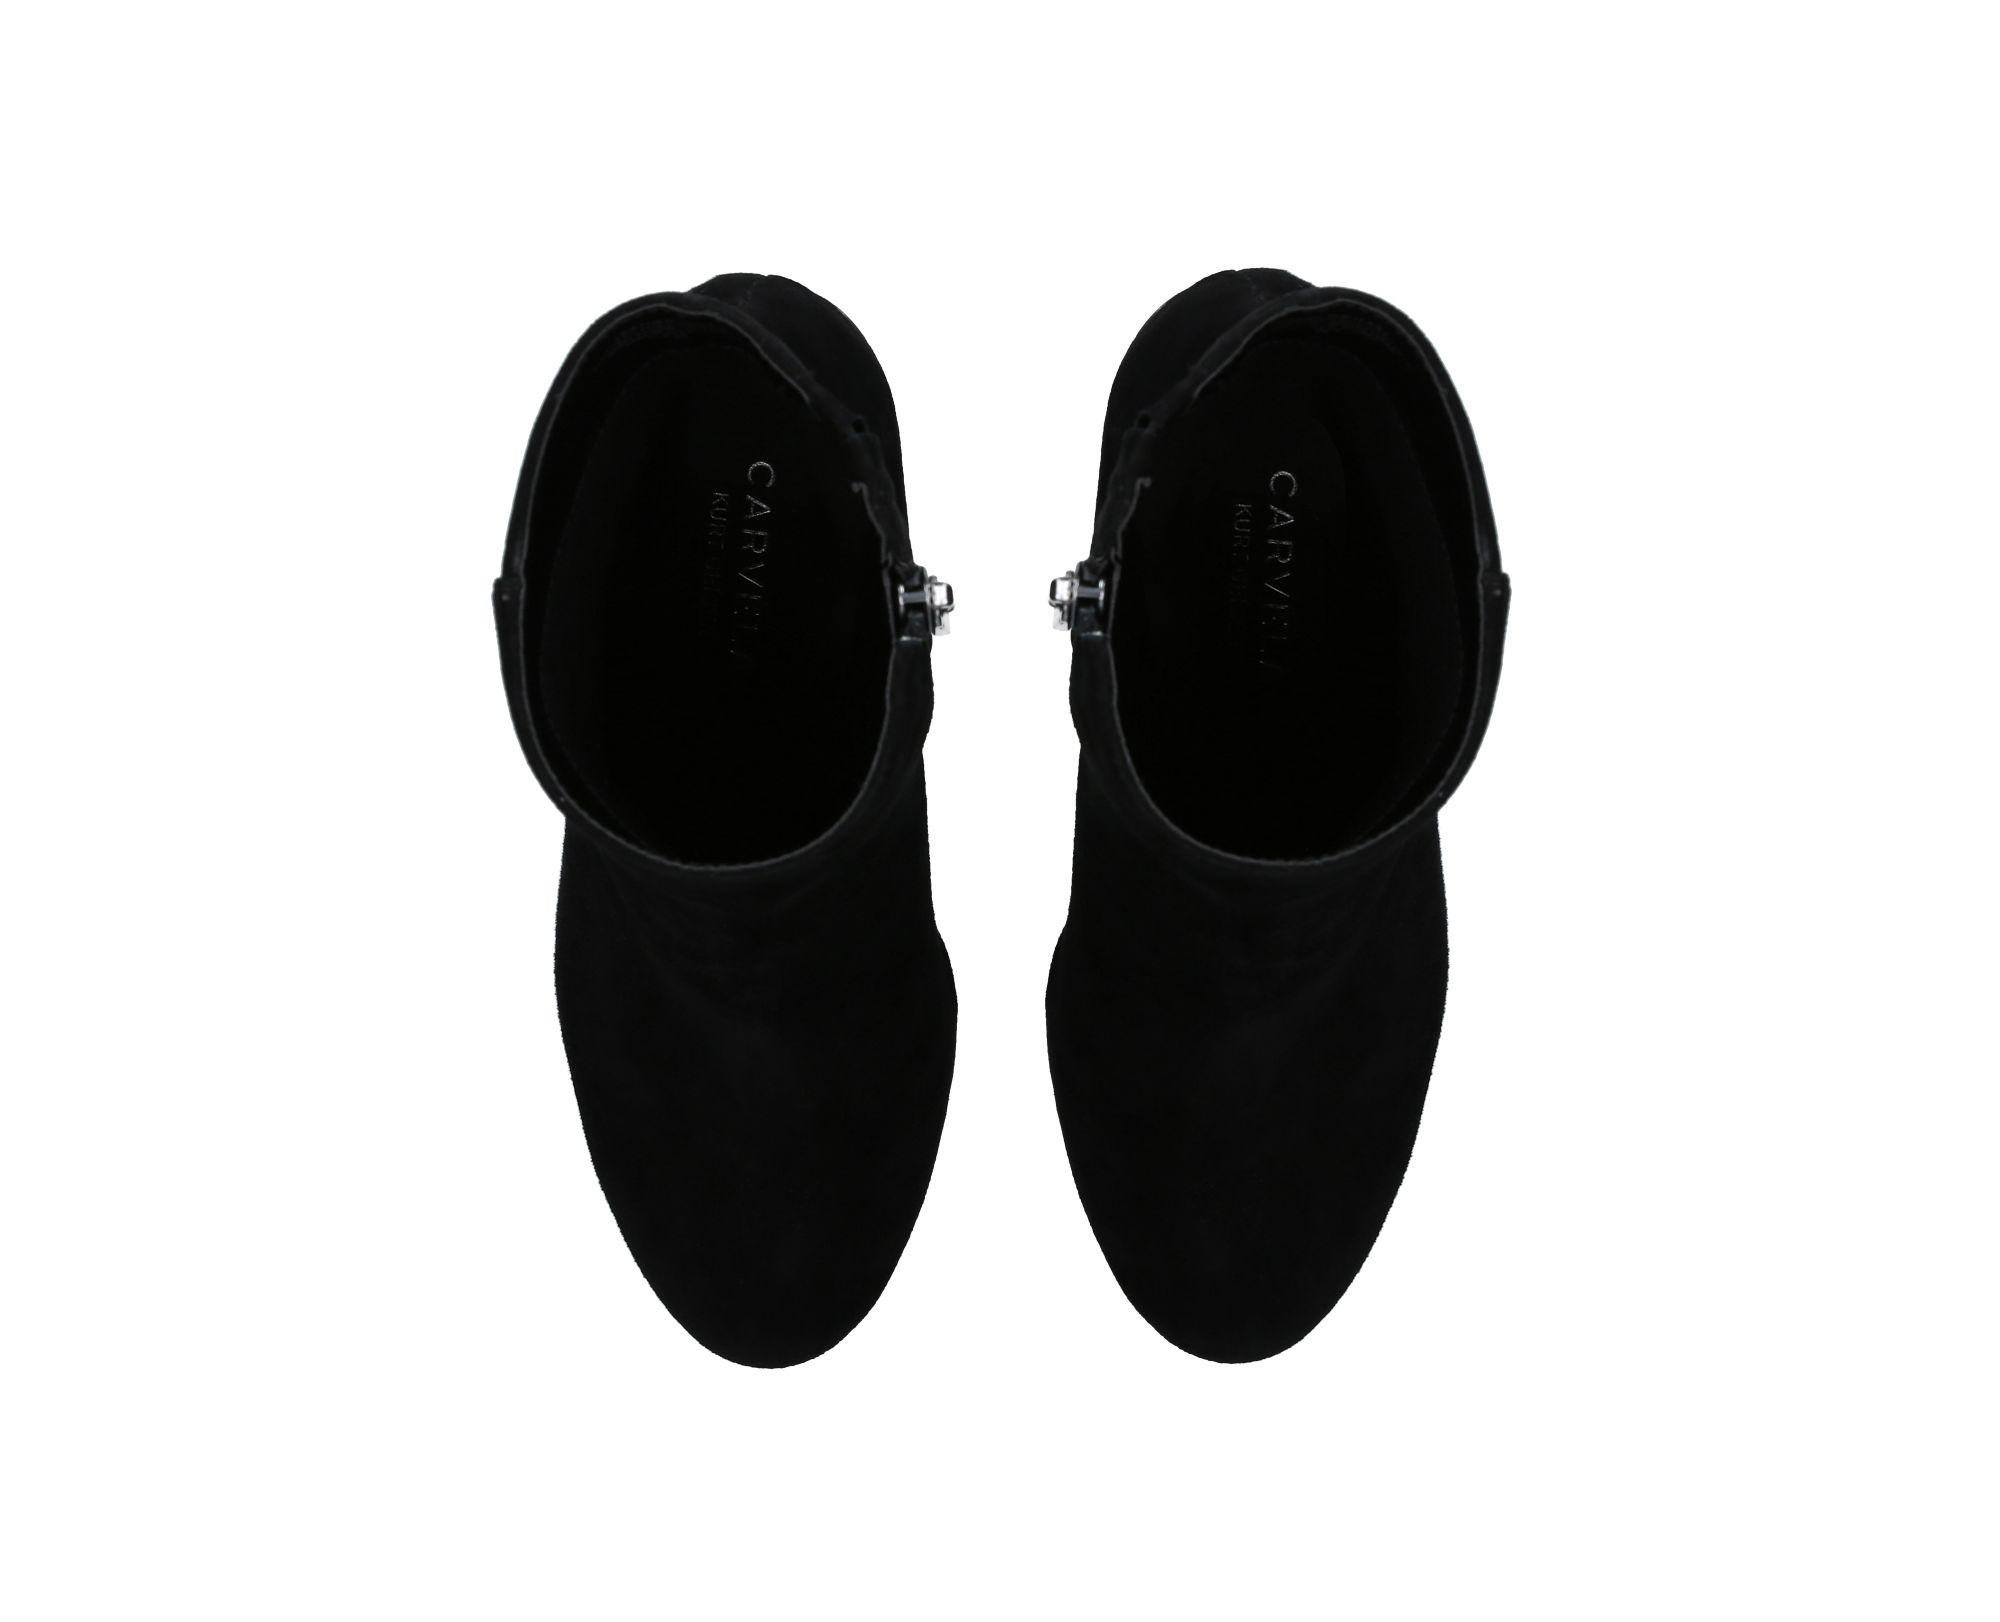 1c349cdfa Carvela Kurt Geiger - Black Smile High Heel Ankle Boots - Lyst. View  fullscreen